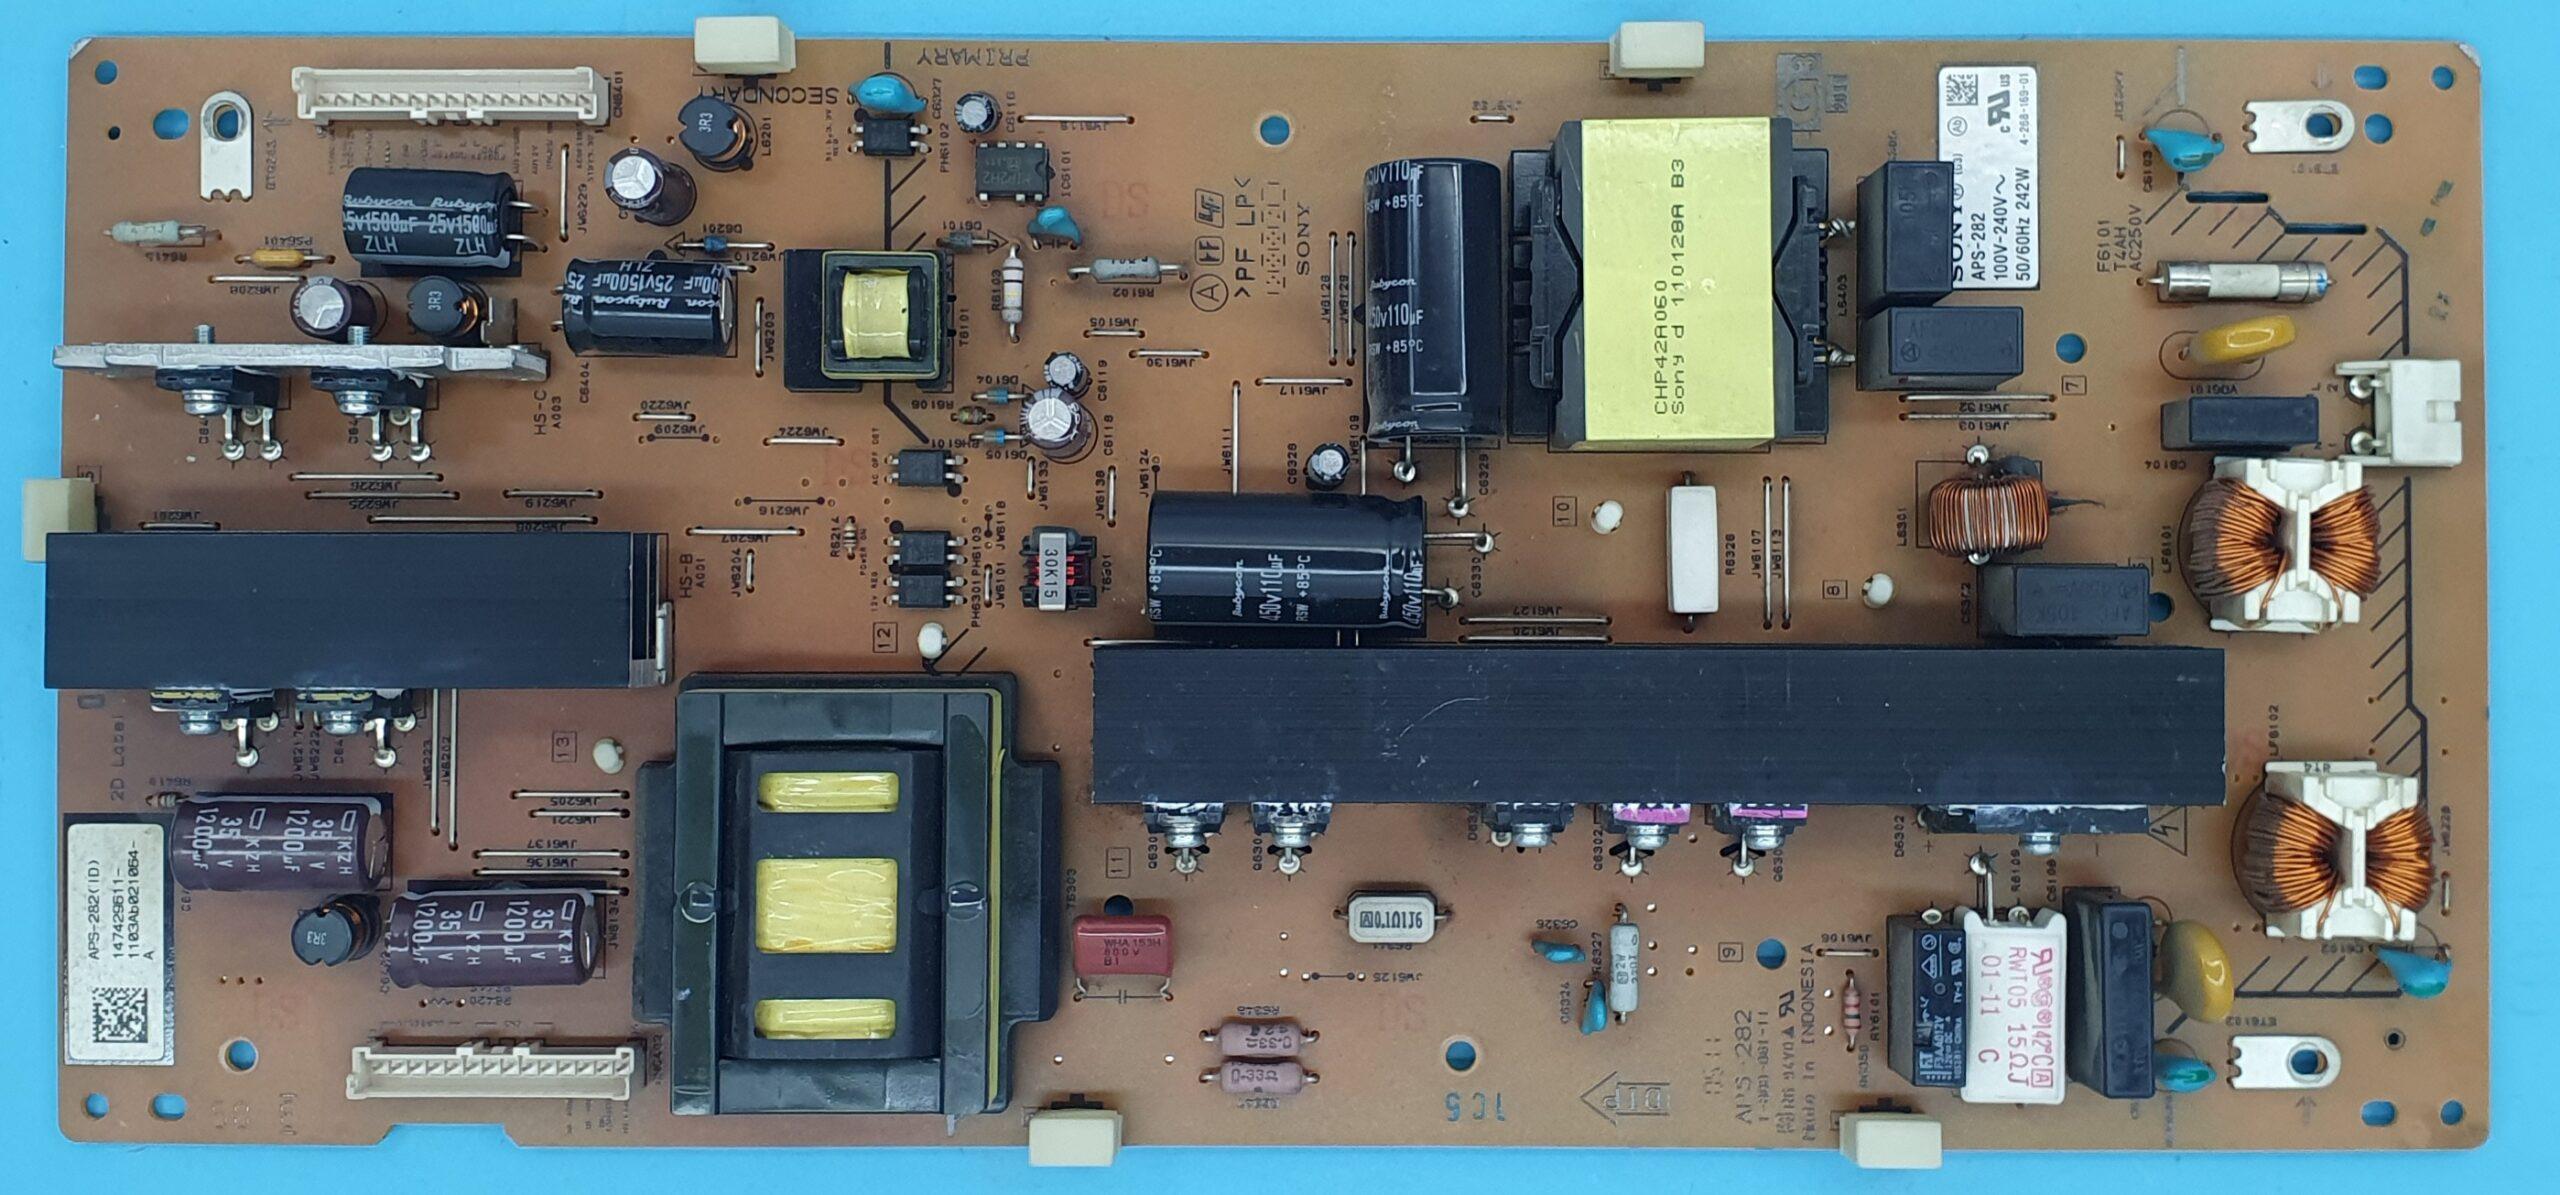 APS-282,1-883-861-11 Sony Power (KDV DAHİL = 150 TL)